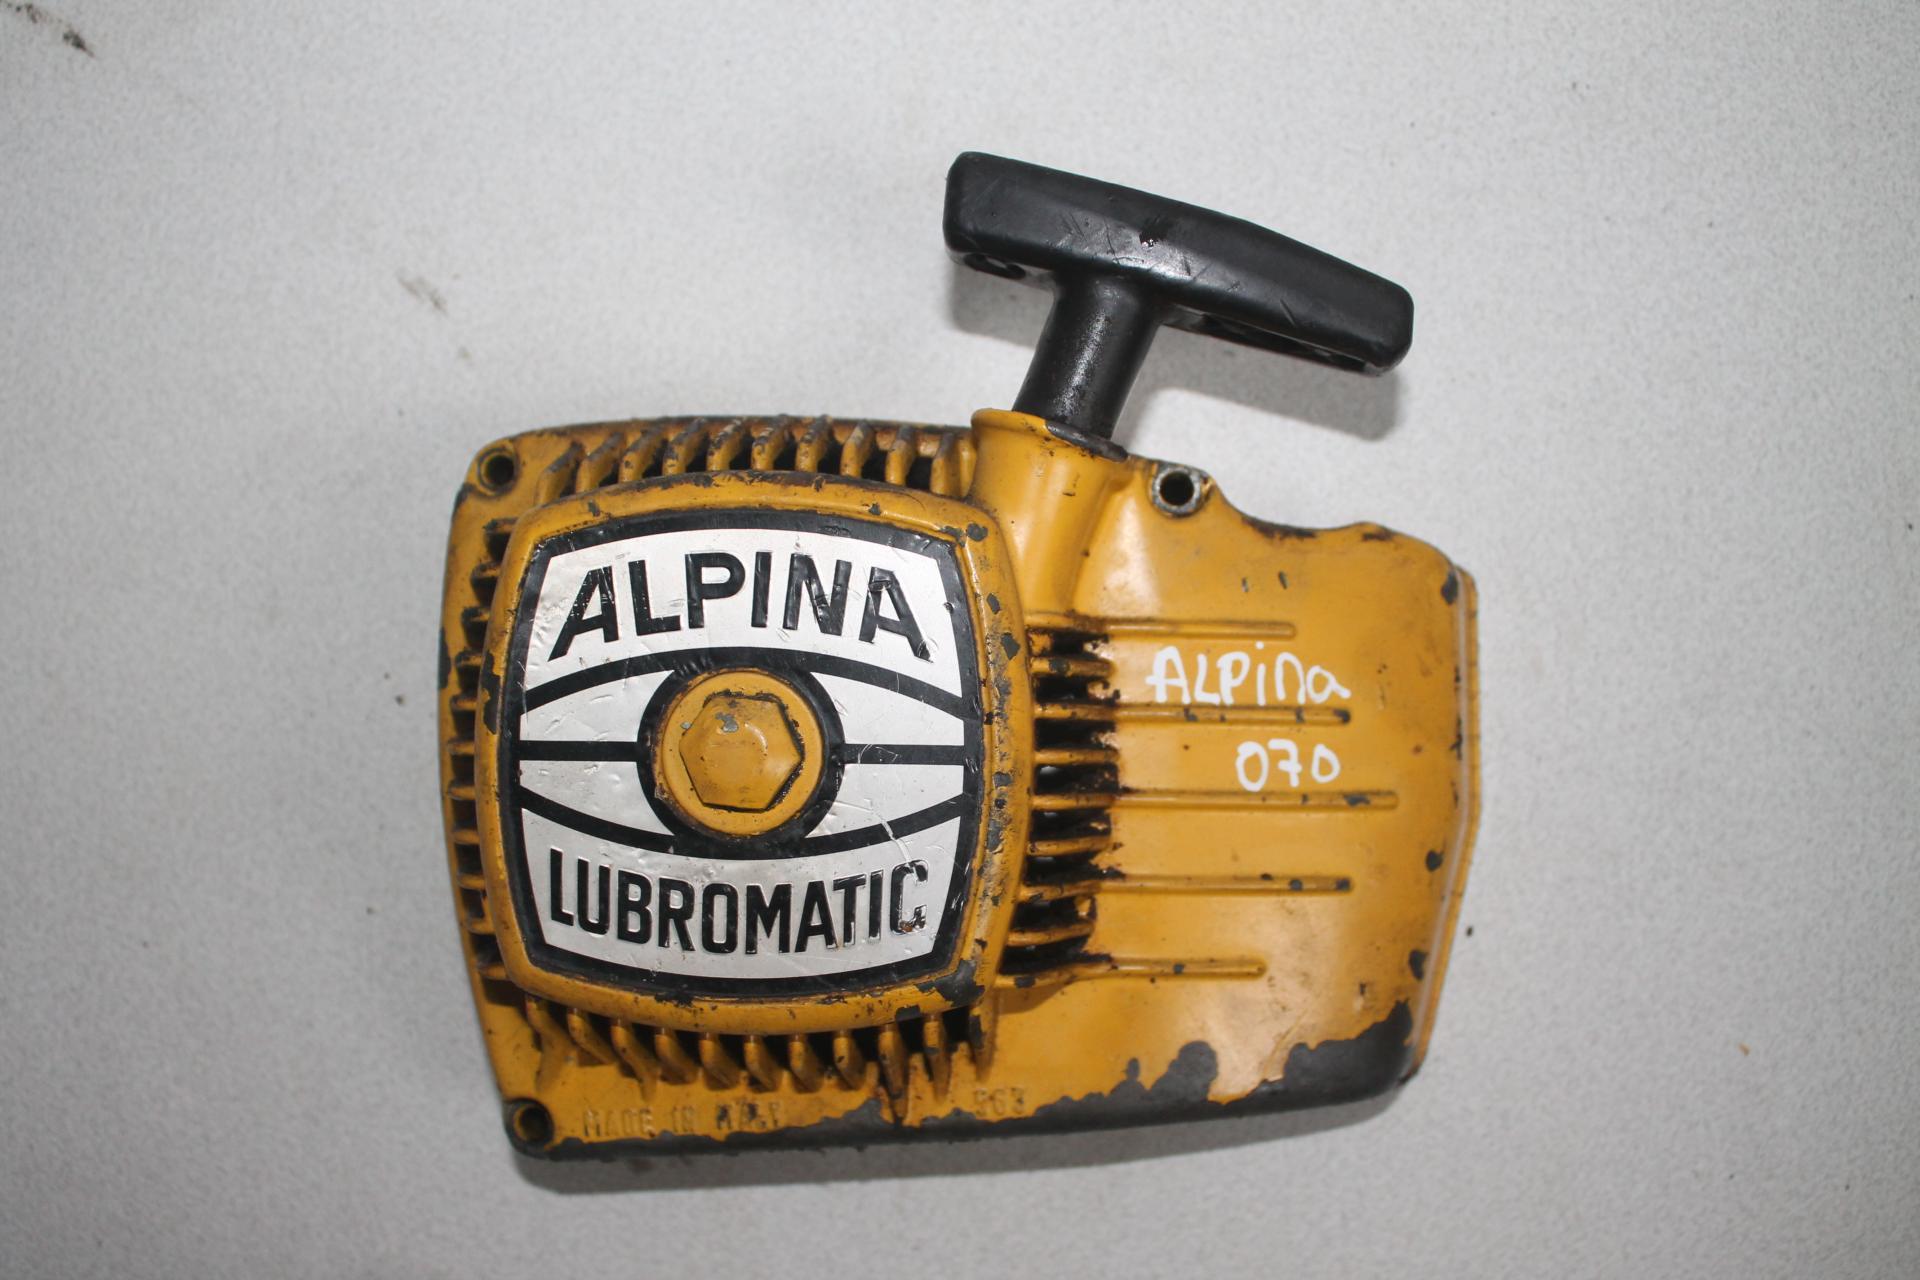 Arranque Alpina 070